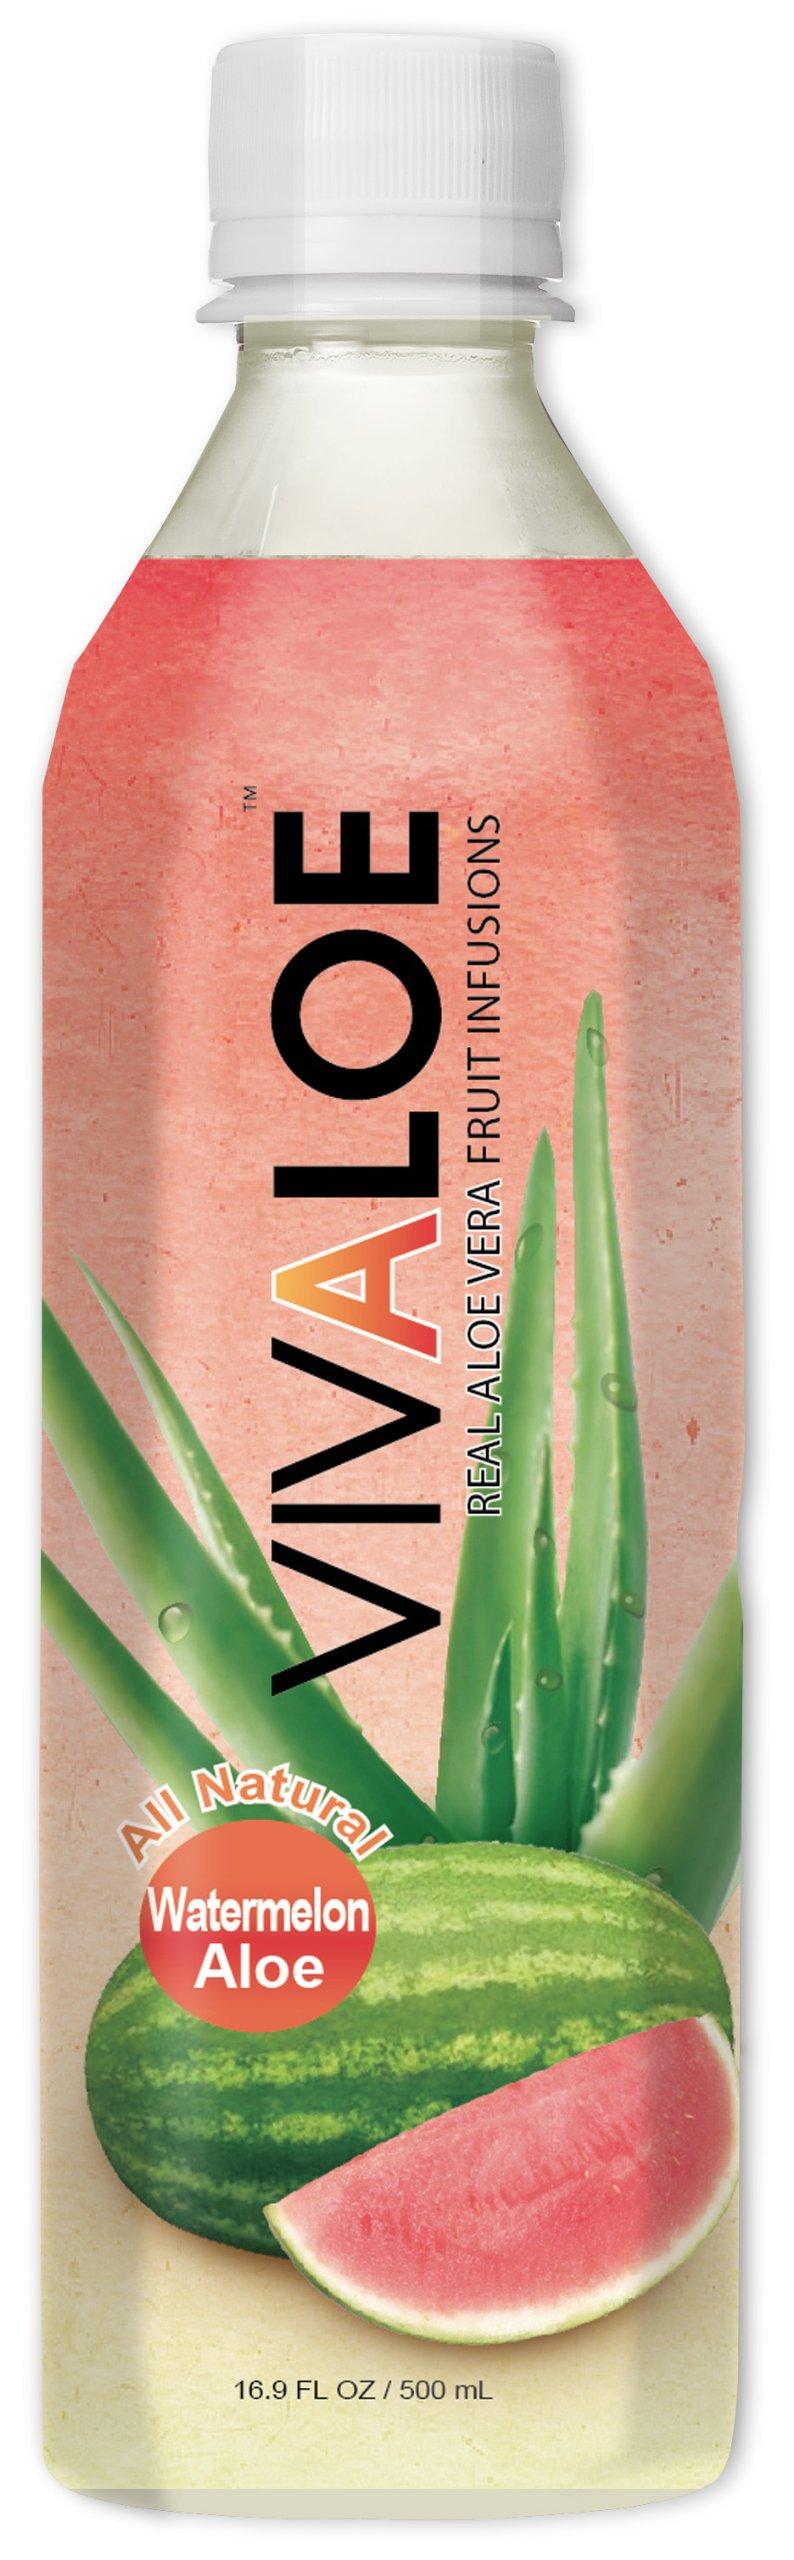 Vivaloe Watermelon Flavor Aloe Beverage All Natural Aloe Juice, 16.9 fl. oz./500 mL, 12 Count